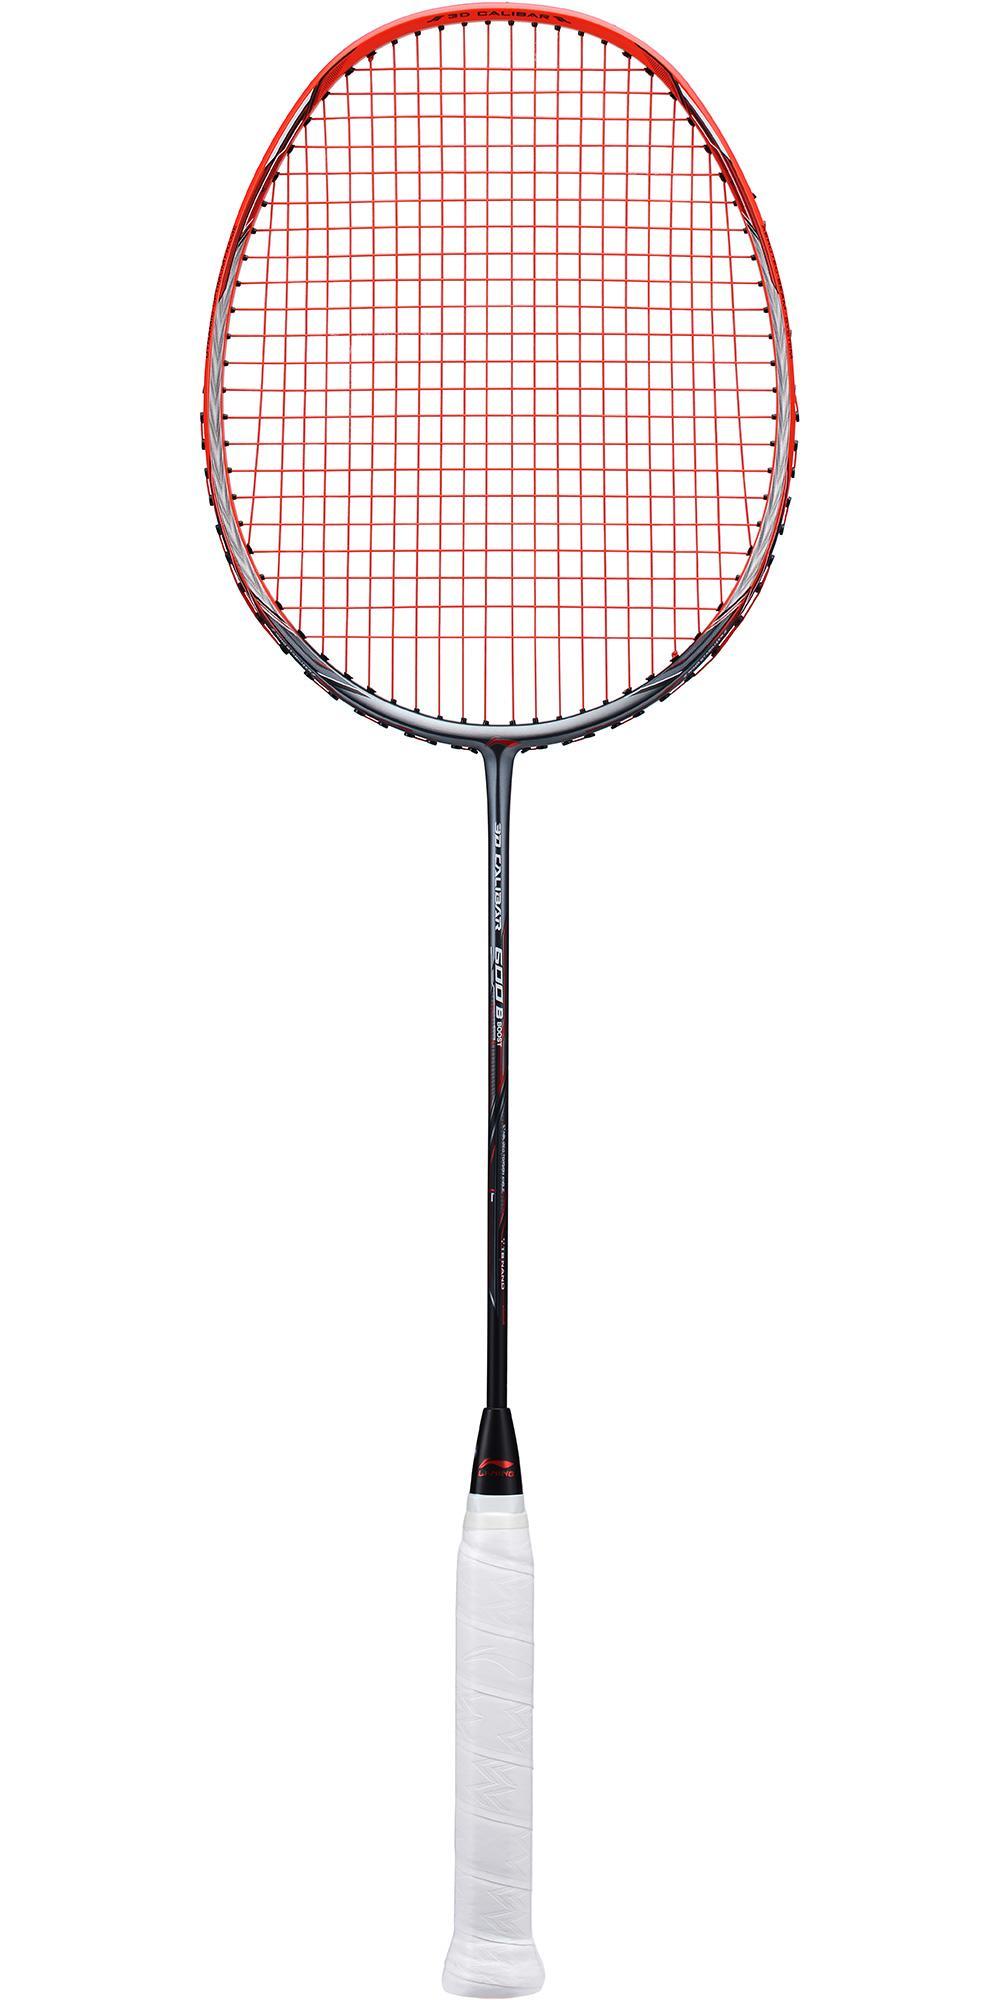 Li Ning Badminton Schl/äger-Saite Badminton-String No 5 Gold